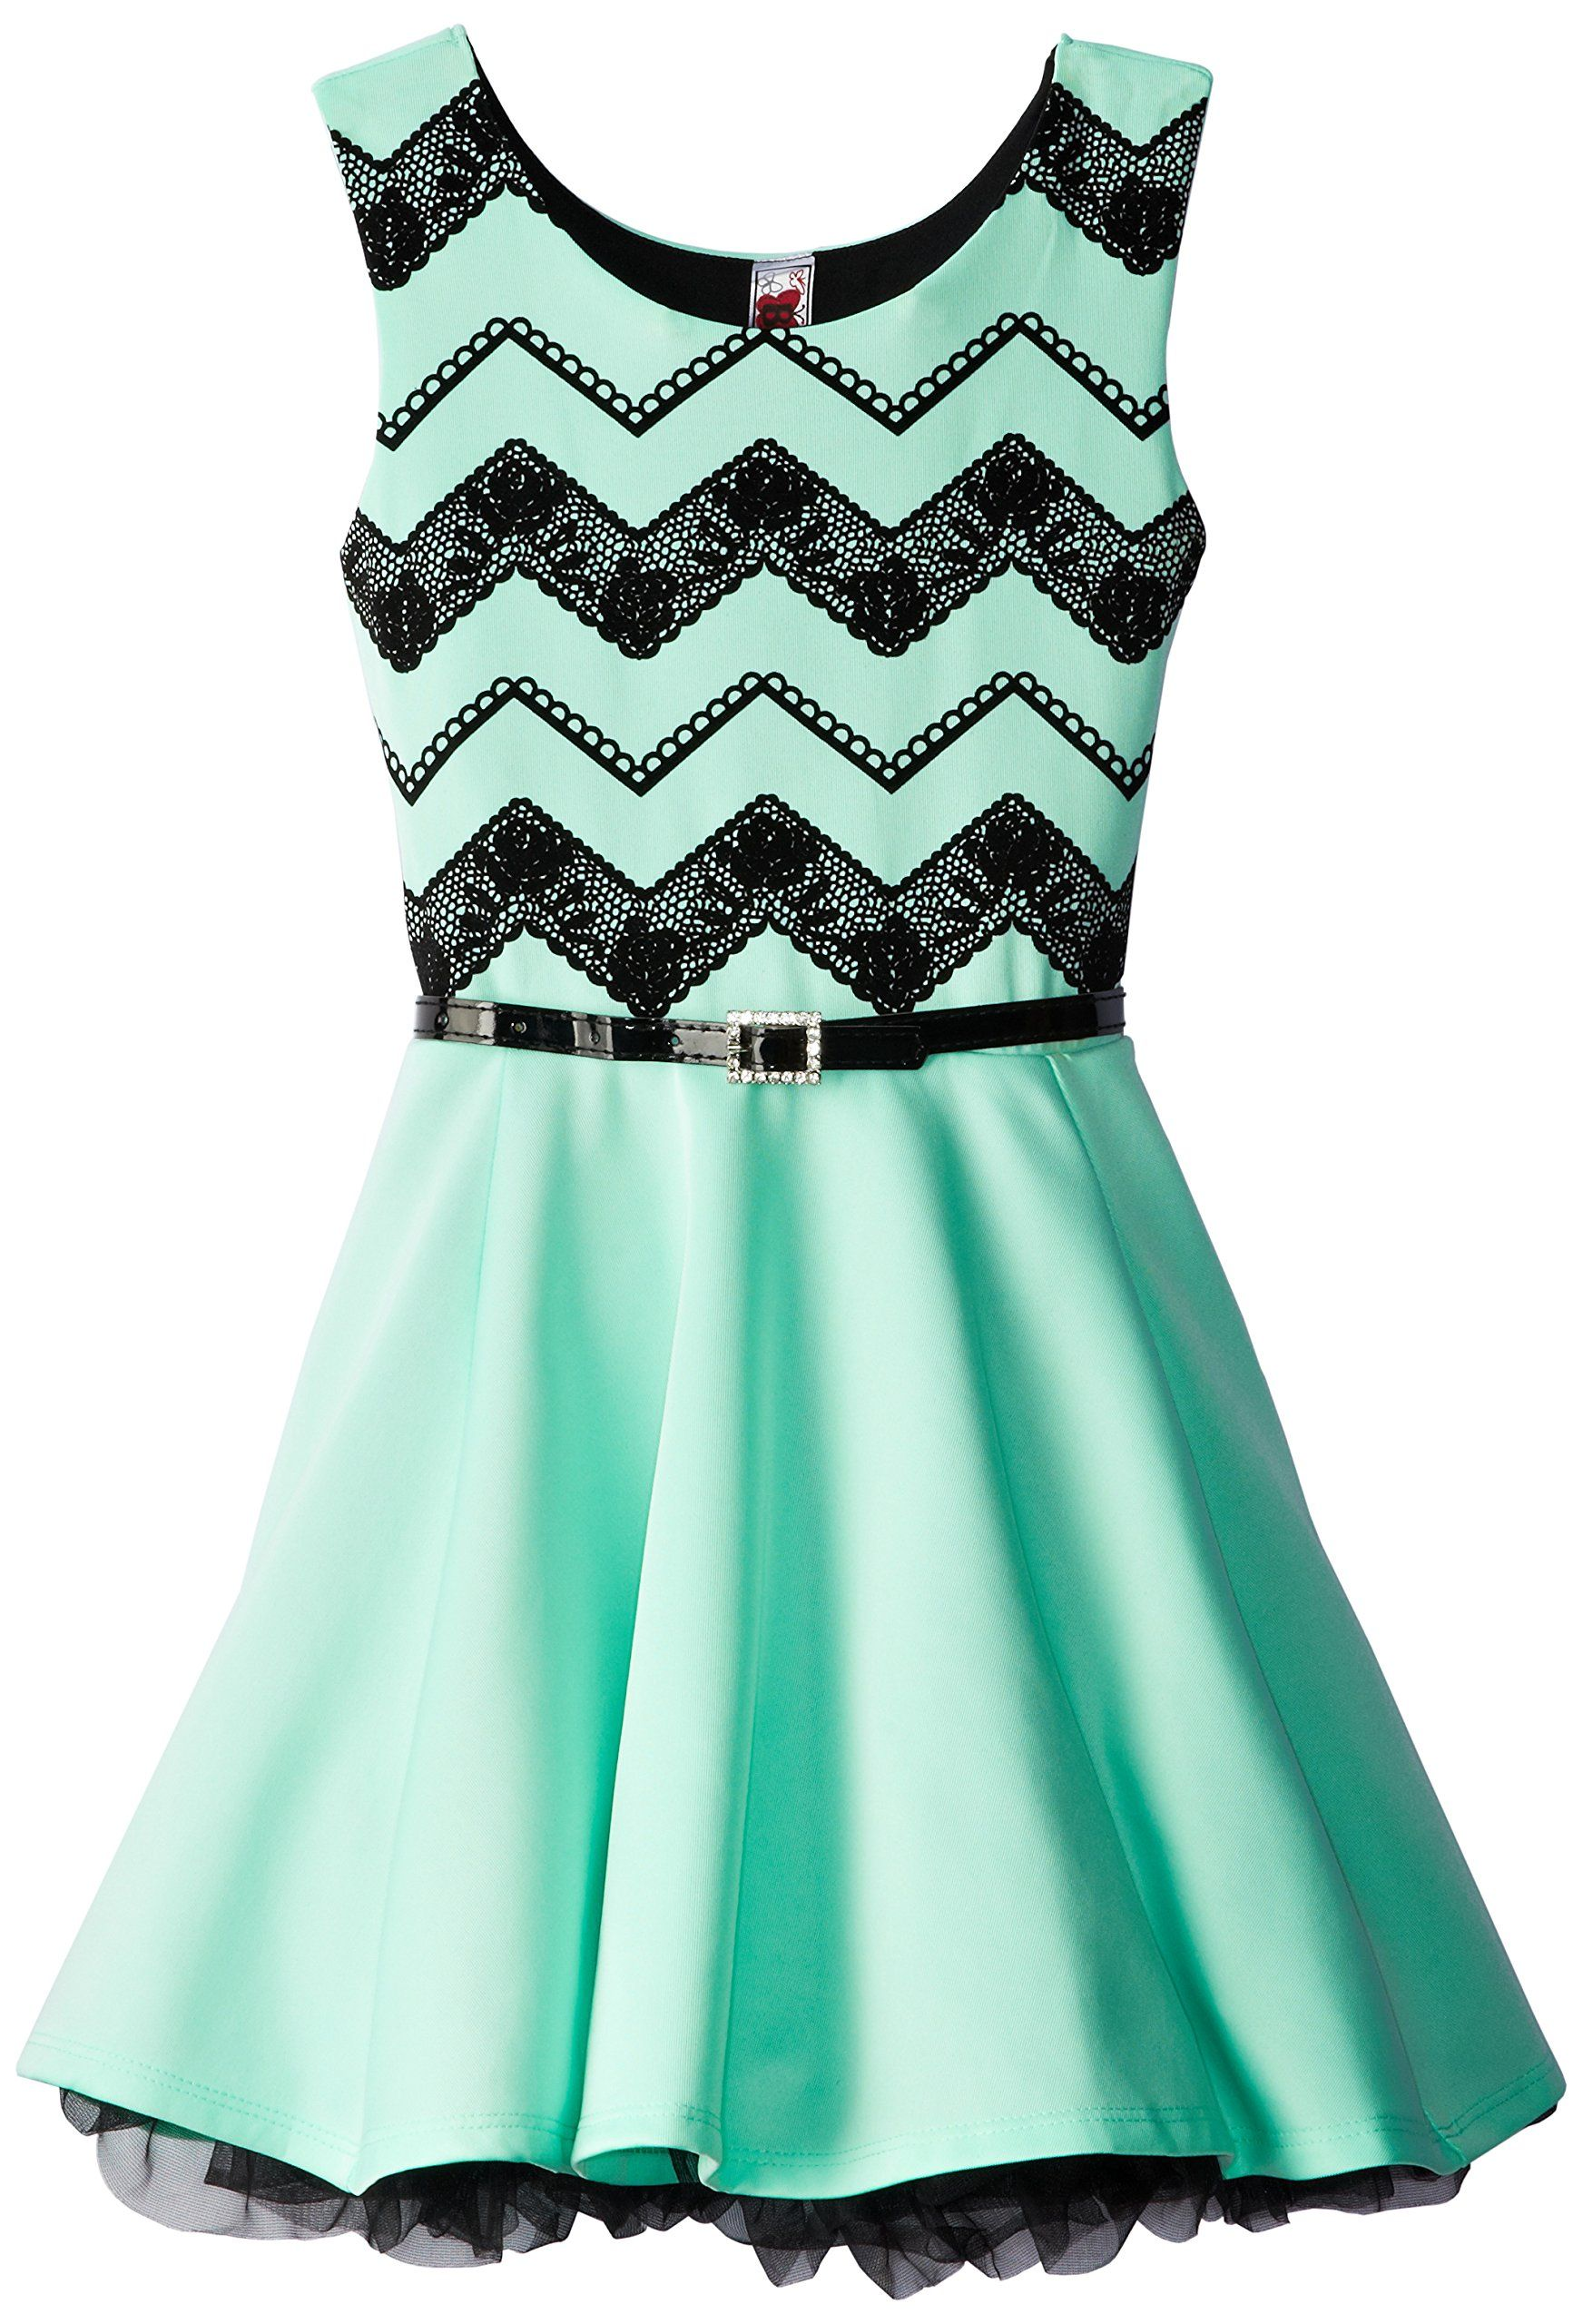 Beautees Big Girls Printed Lace Dress Mint 16 Anna S